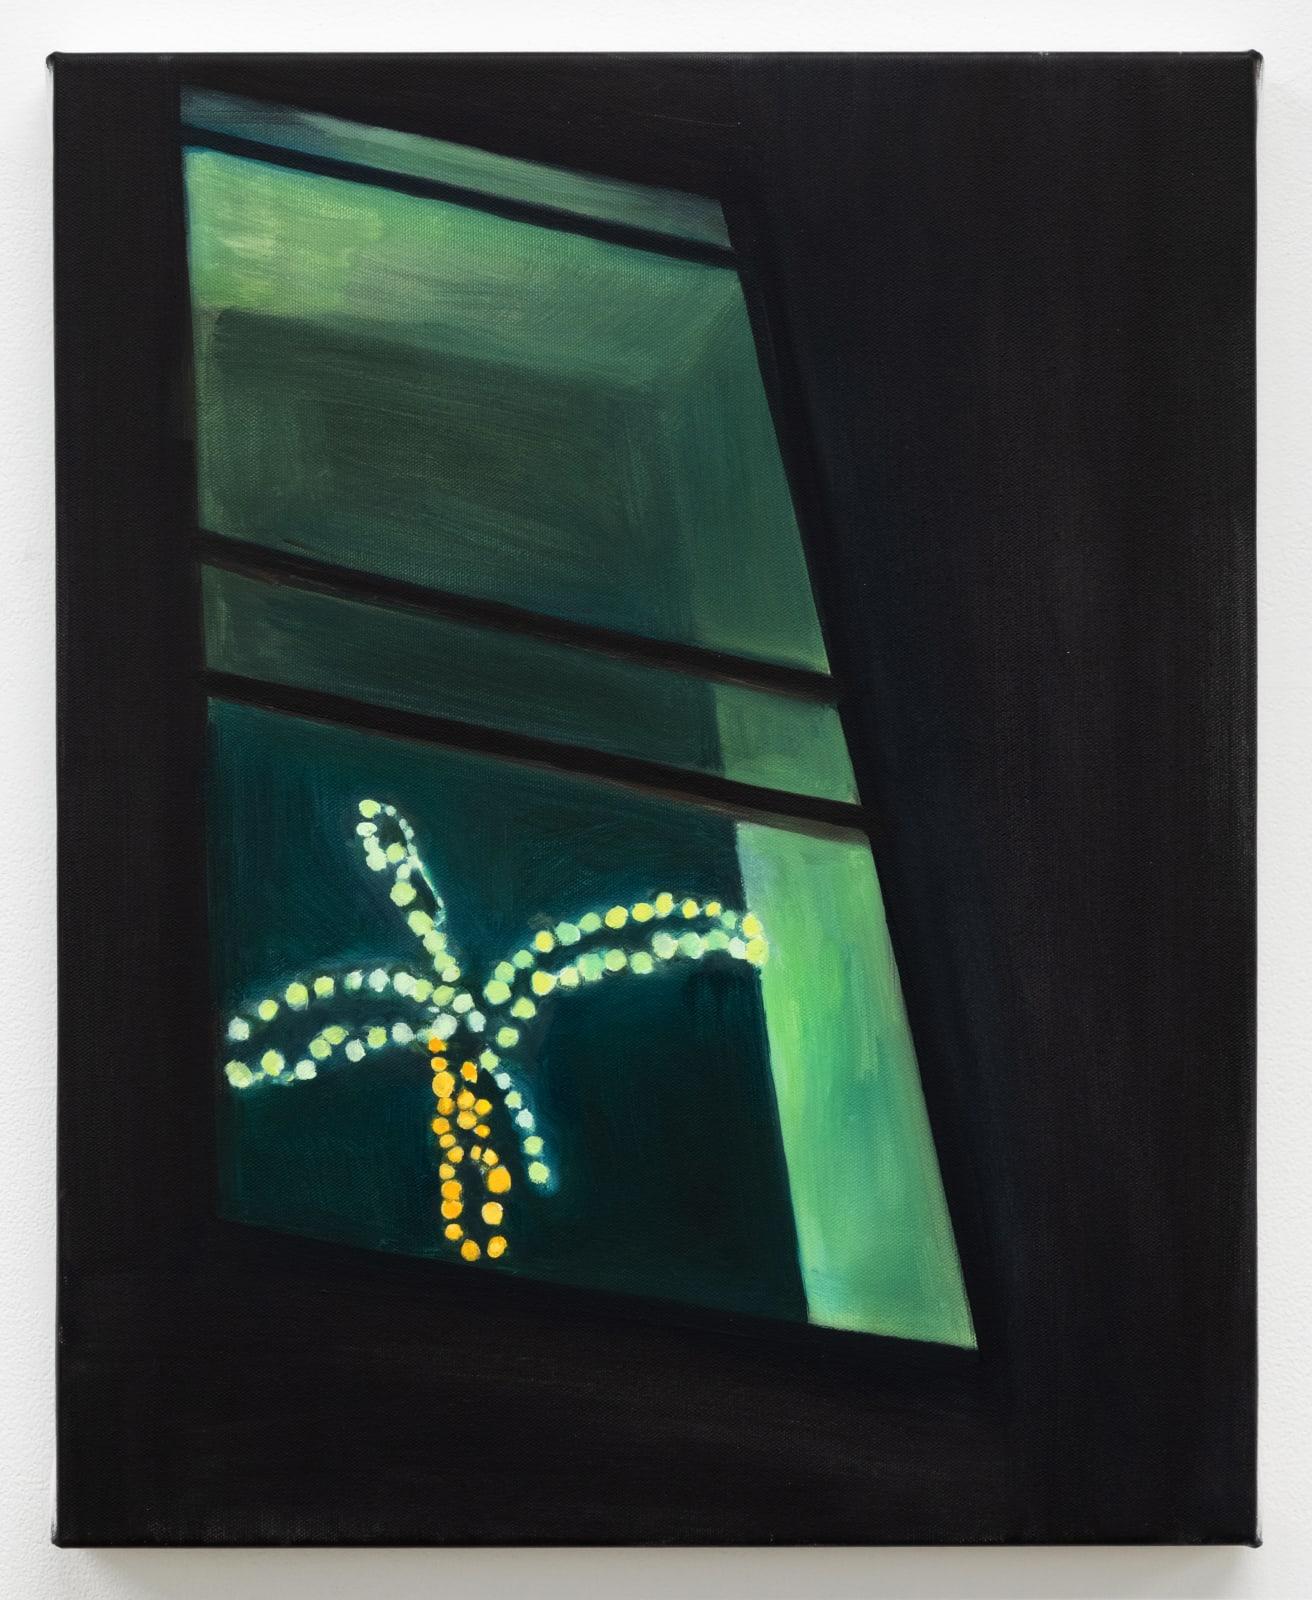 Aglaé Bassens, Neon Palm, 2021